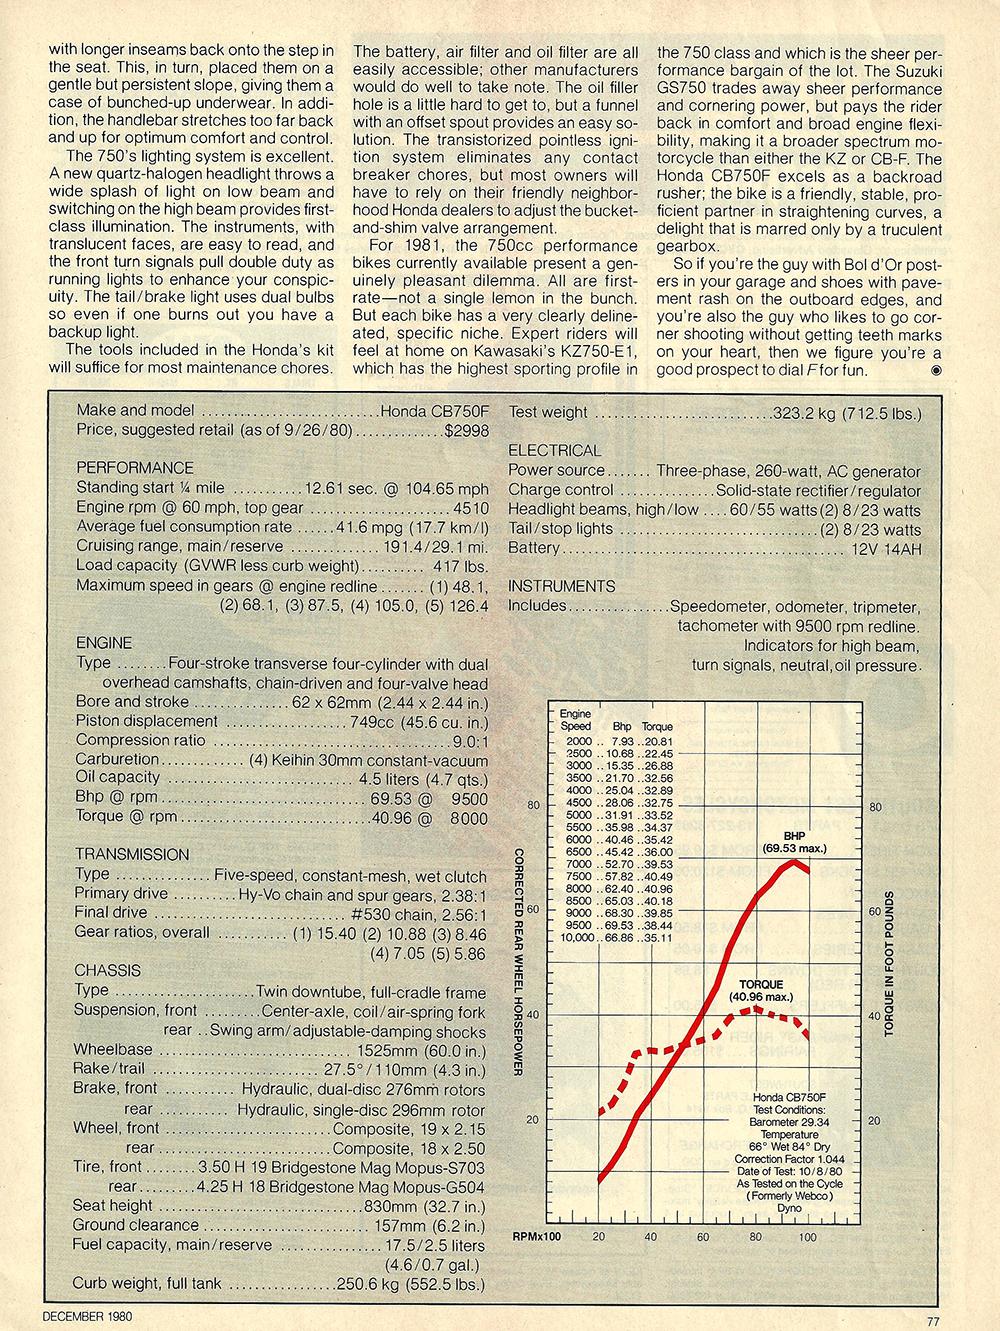 1980 Honda CB750F road test 06.jpg